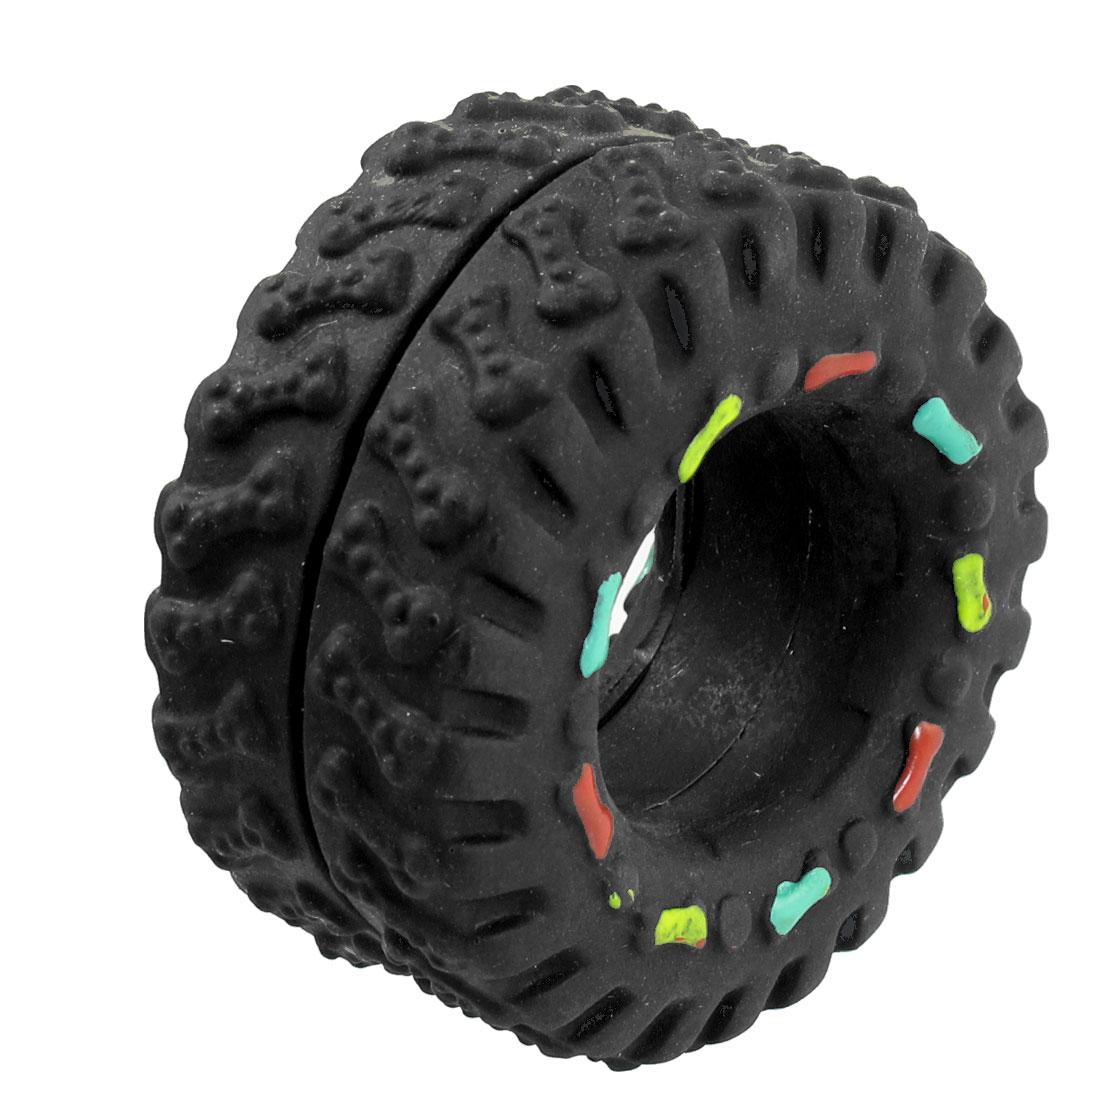 Vinyl Rubber Tire Tyre Shaped Bone Pattern Squeaky Dog Cat Pet Toy Black